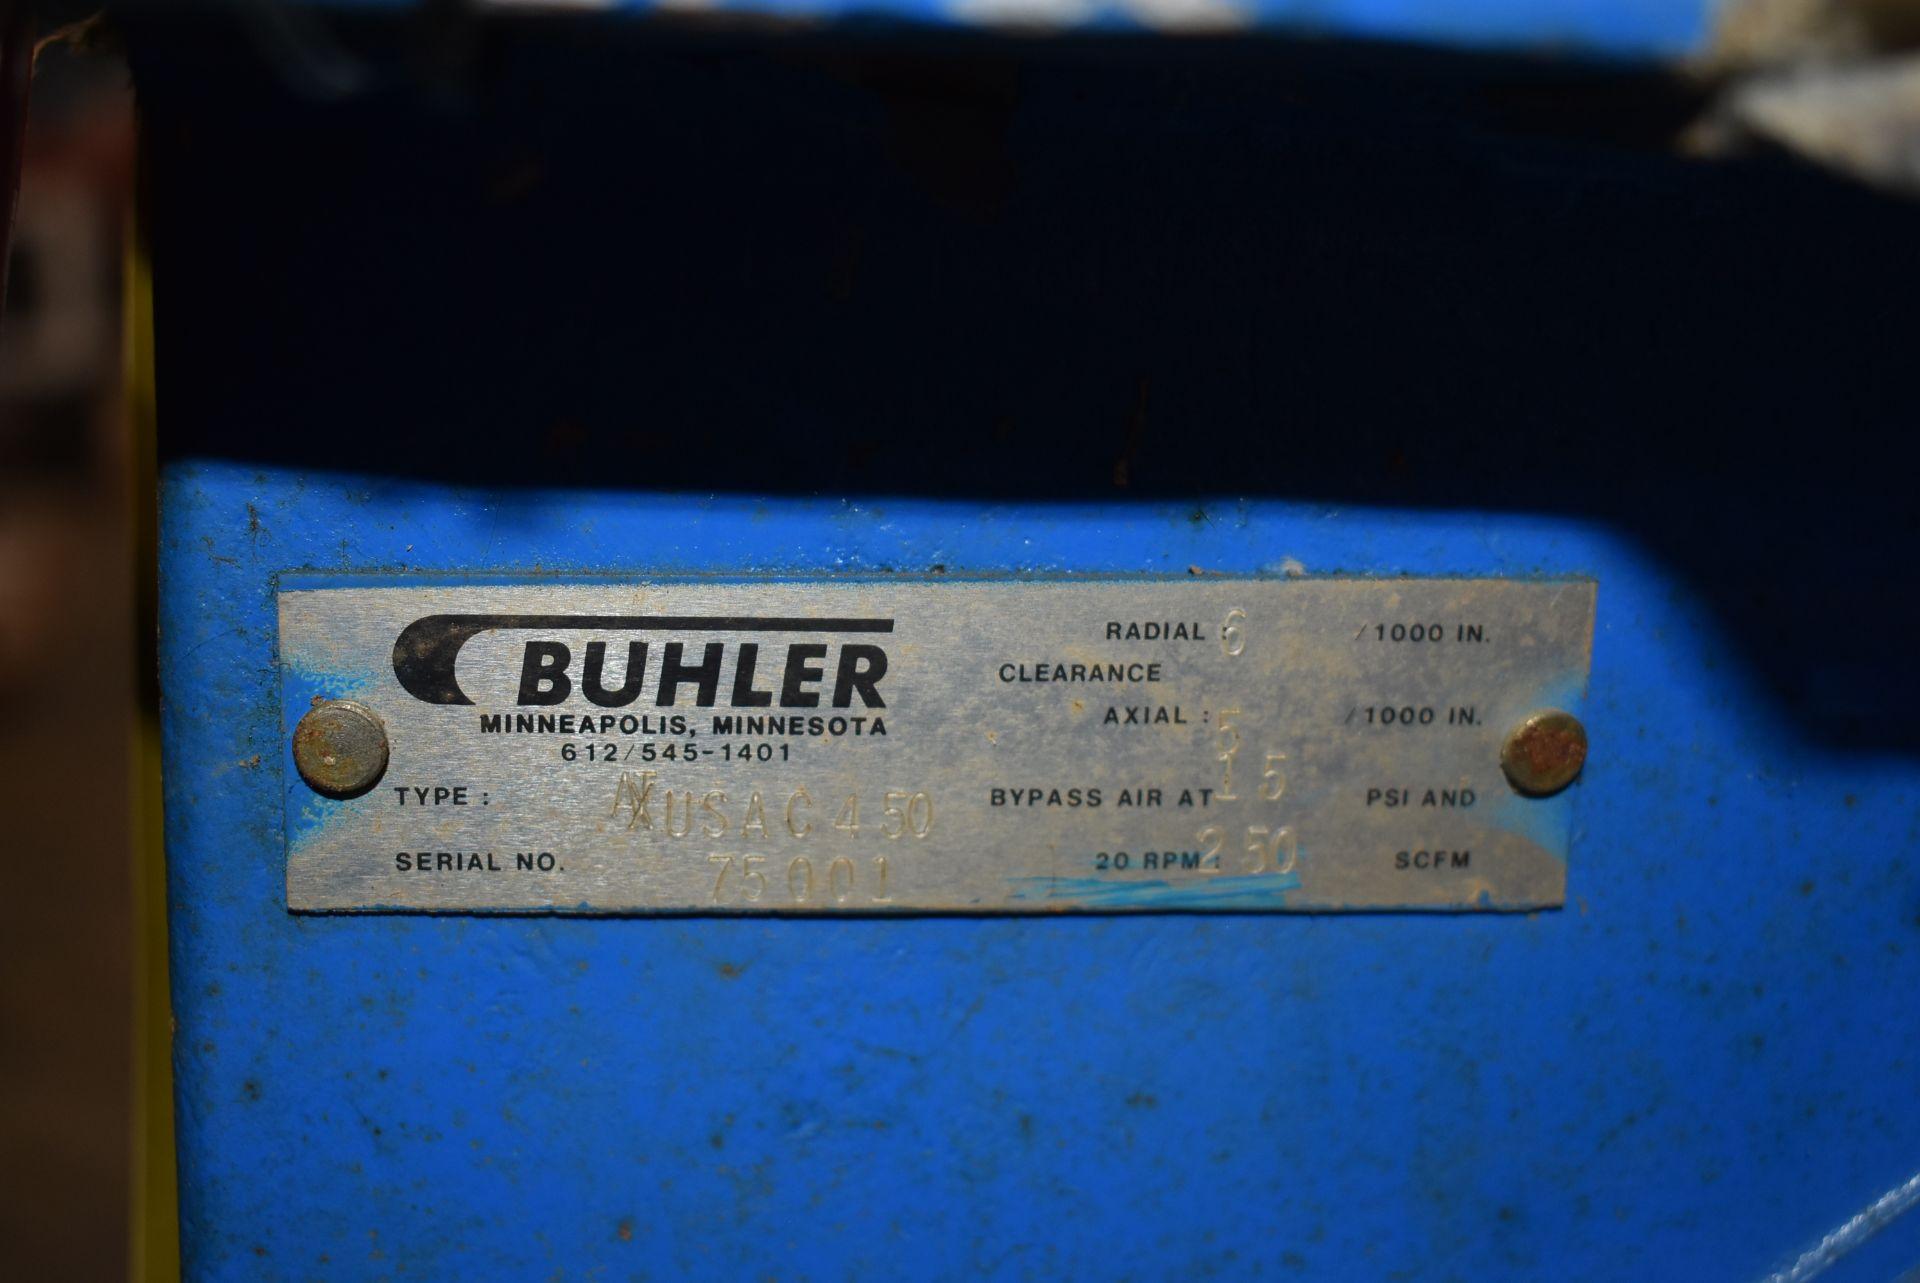 Buhler Model #58/60 Airlock, SN 75001 - Image 2 of 4